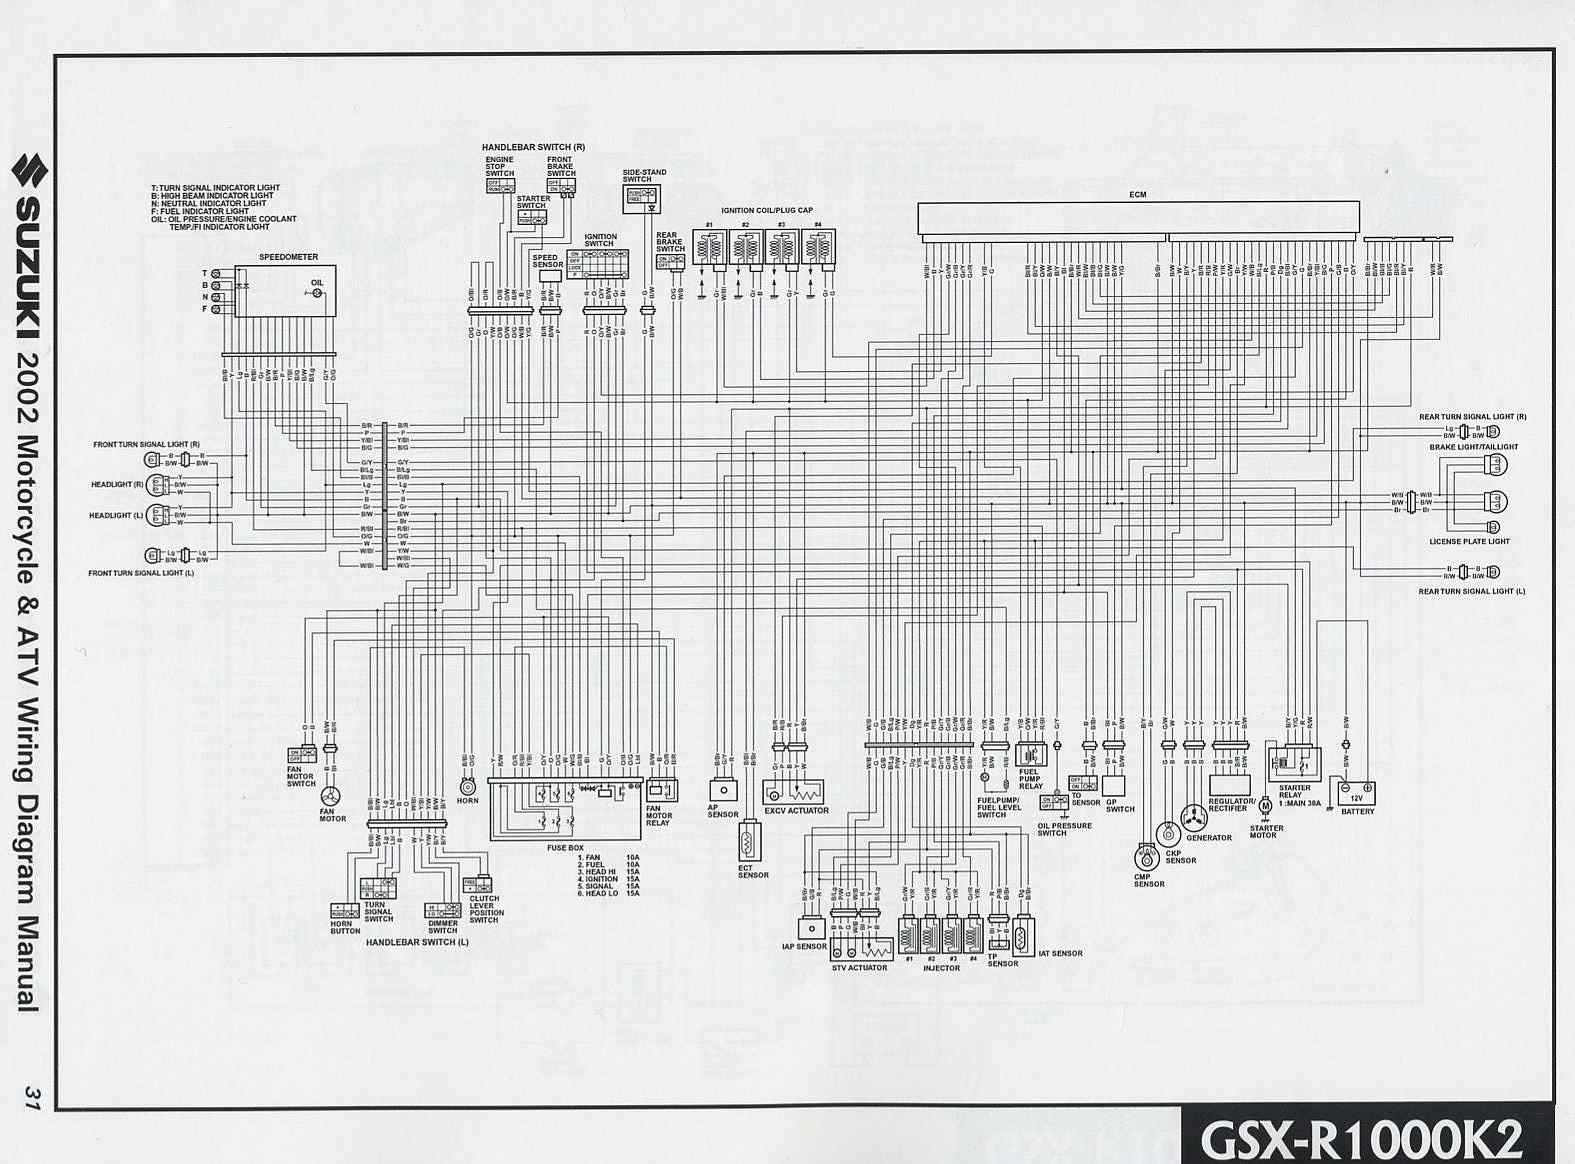 Gsxr 1000 K3 Wallpaper | hd wallon